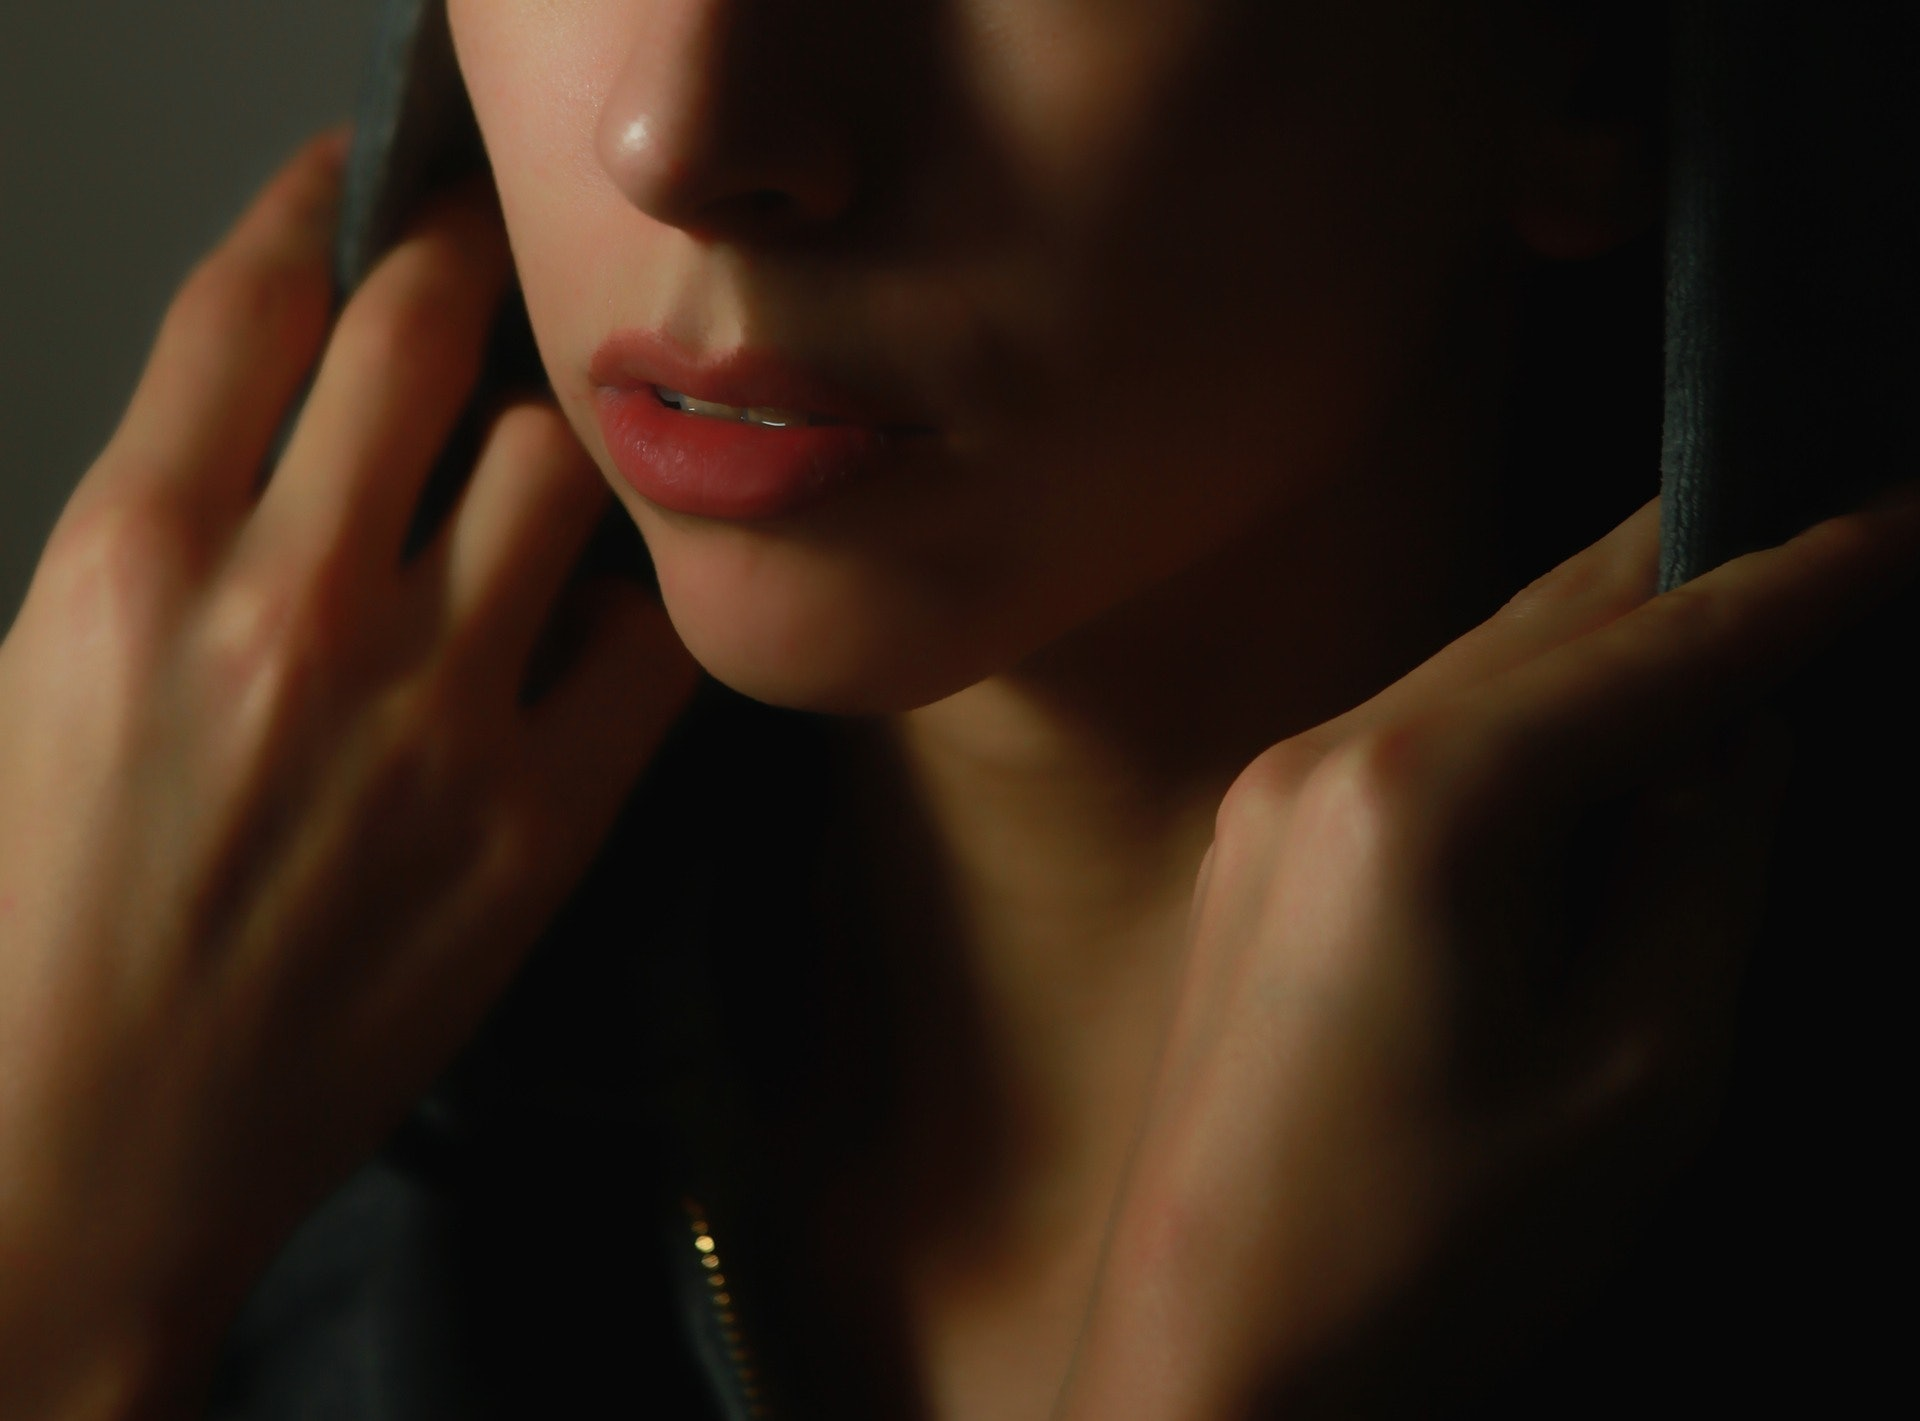 Preventing injury oral sex